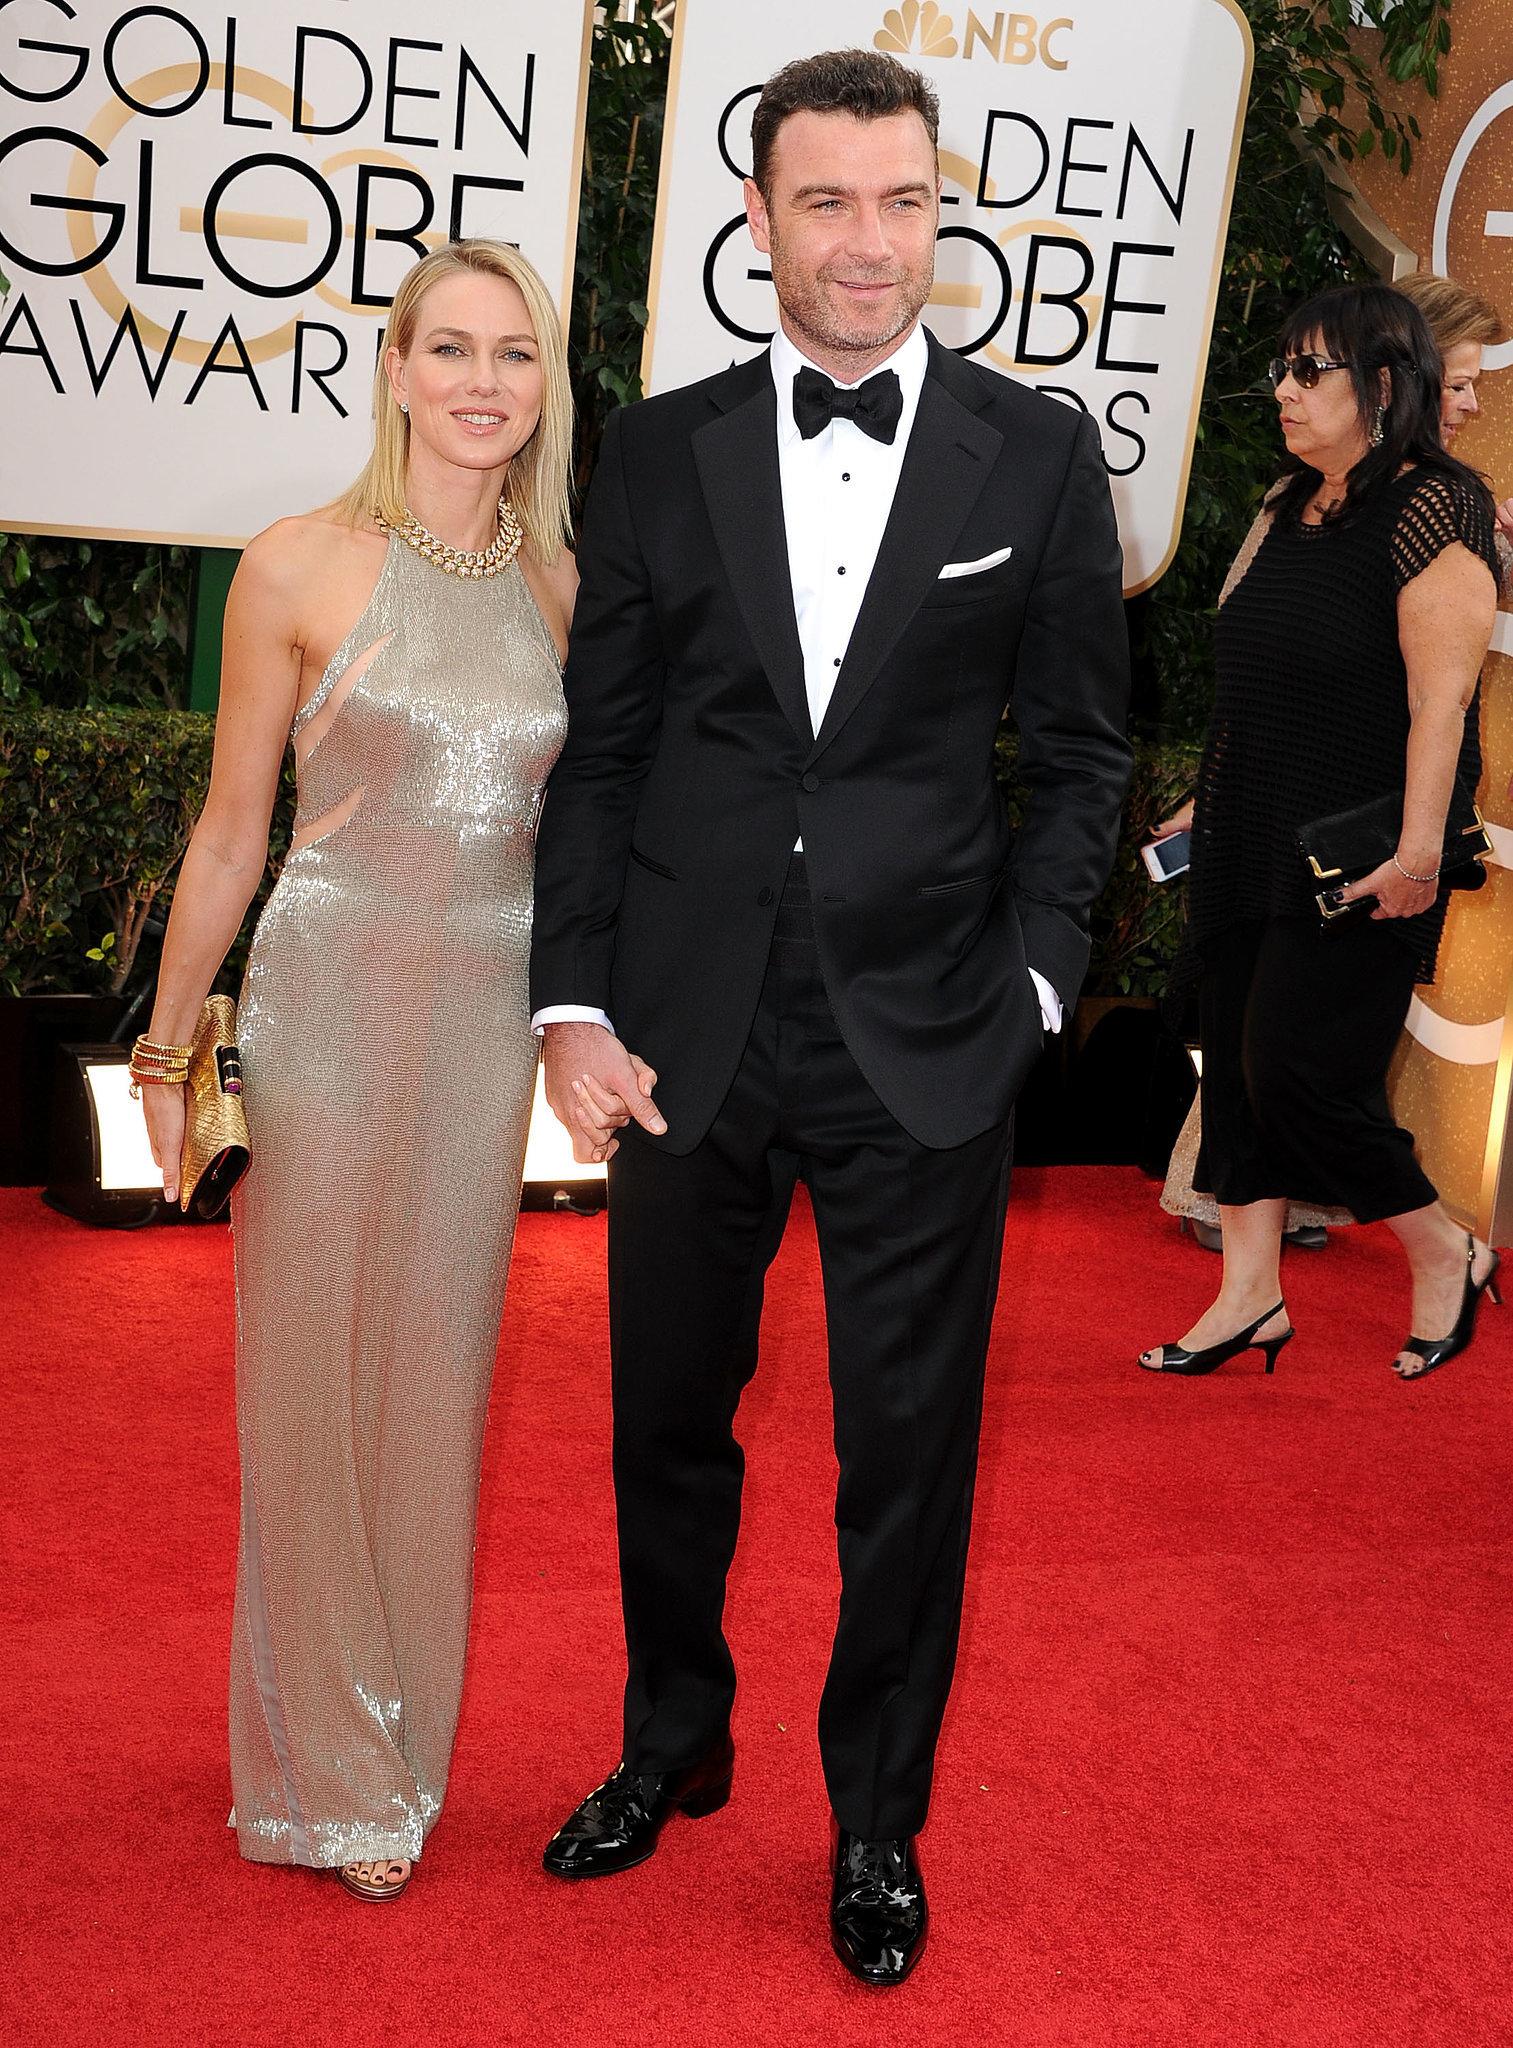 Naomi Watts and Liev Schreiber | Forget Marriage, Bring On ...